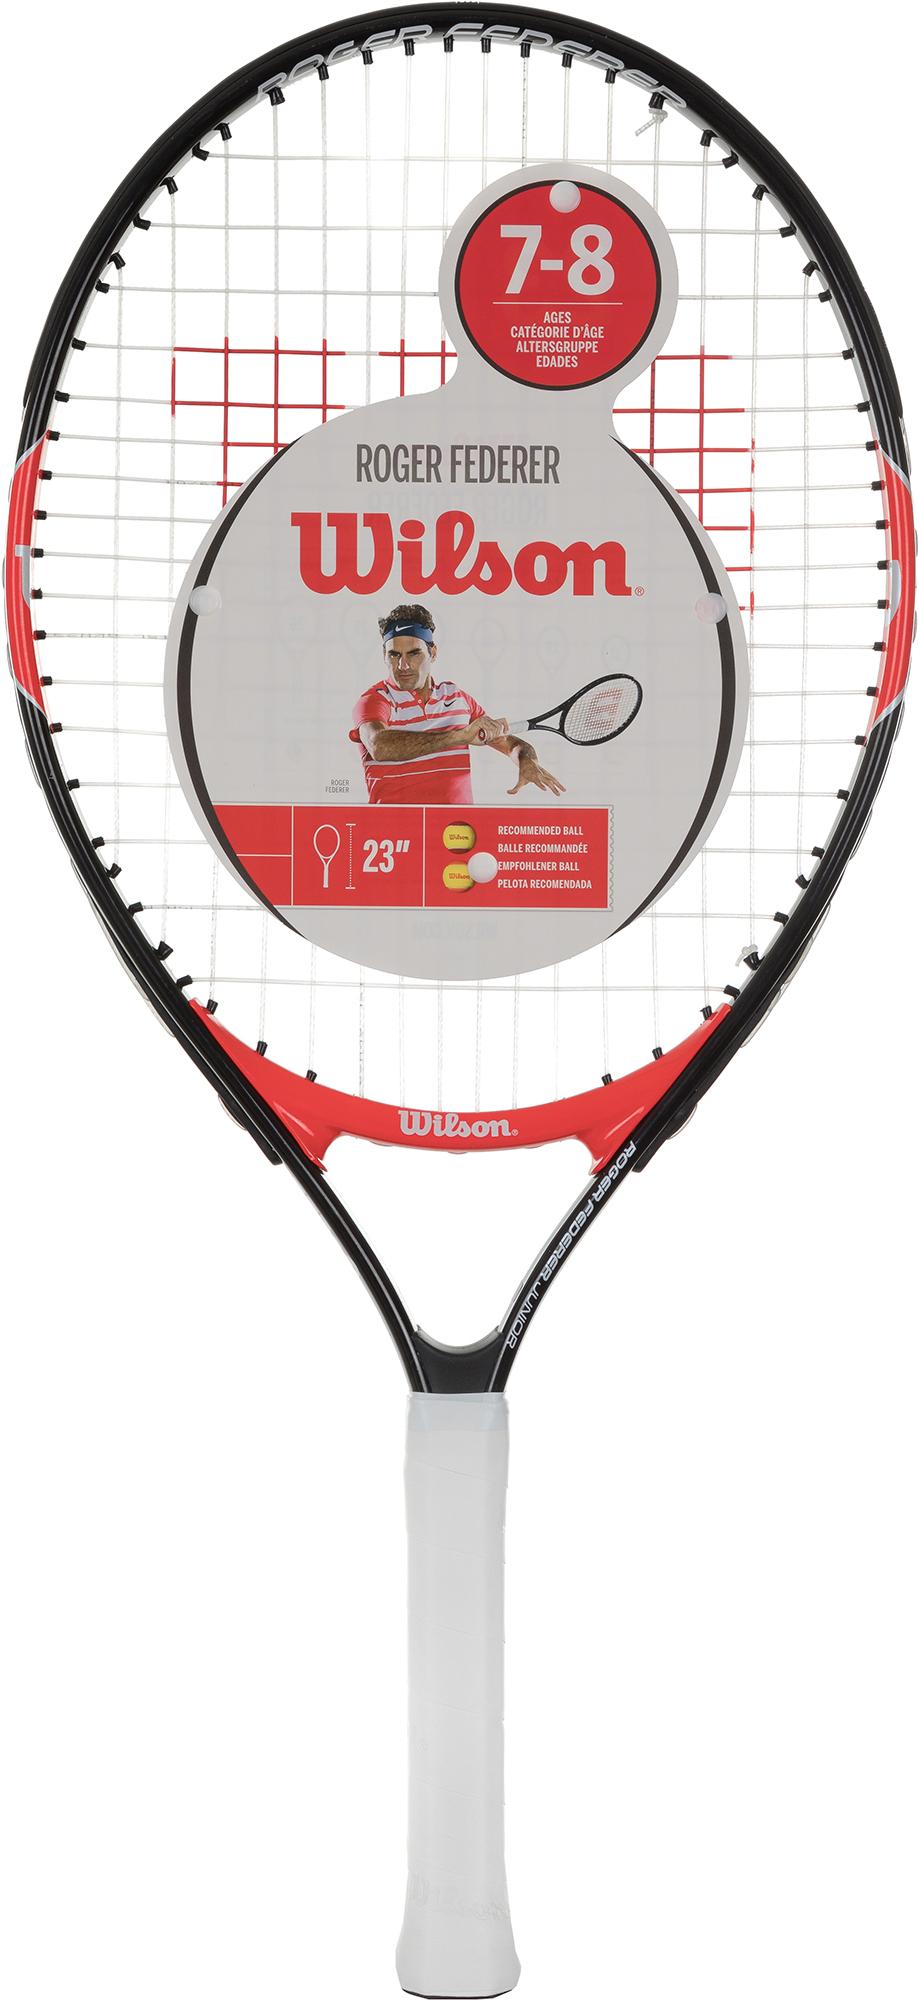 Wilson Ракетка для большого тенниса детская Wilson Roger Federer 23, размер Без размера wilson ракетка для большого тенниса детская wilson roger federer 21 размер без размера